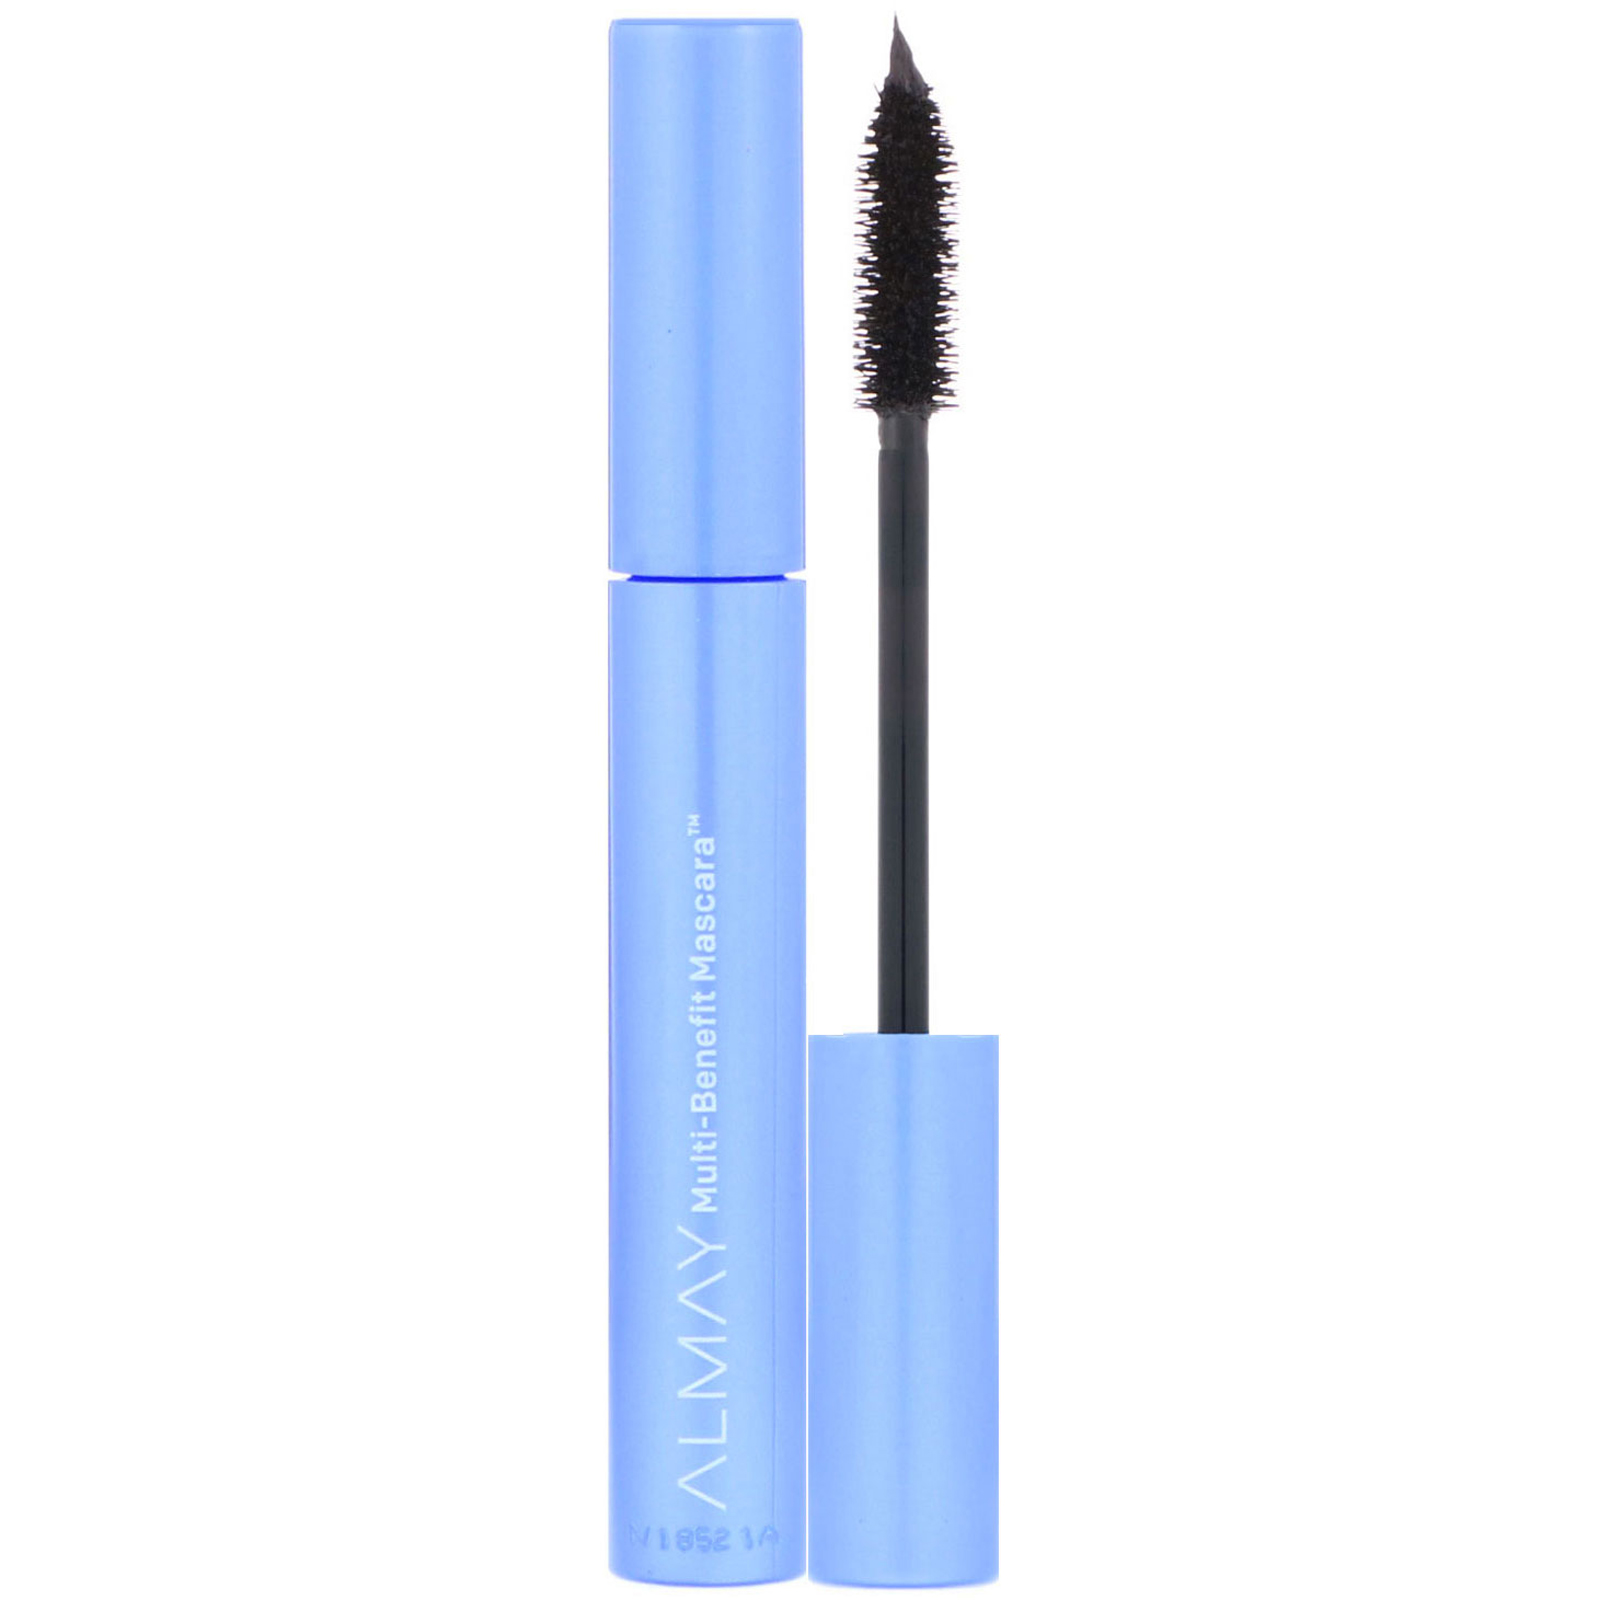 b265209b9dc Almay, Multi-Benefit Mascara, 503, Black Brown, 0.24 fl oz (7 ml)  (Discontinued Item)